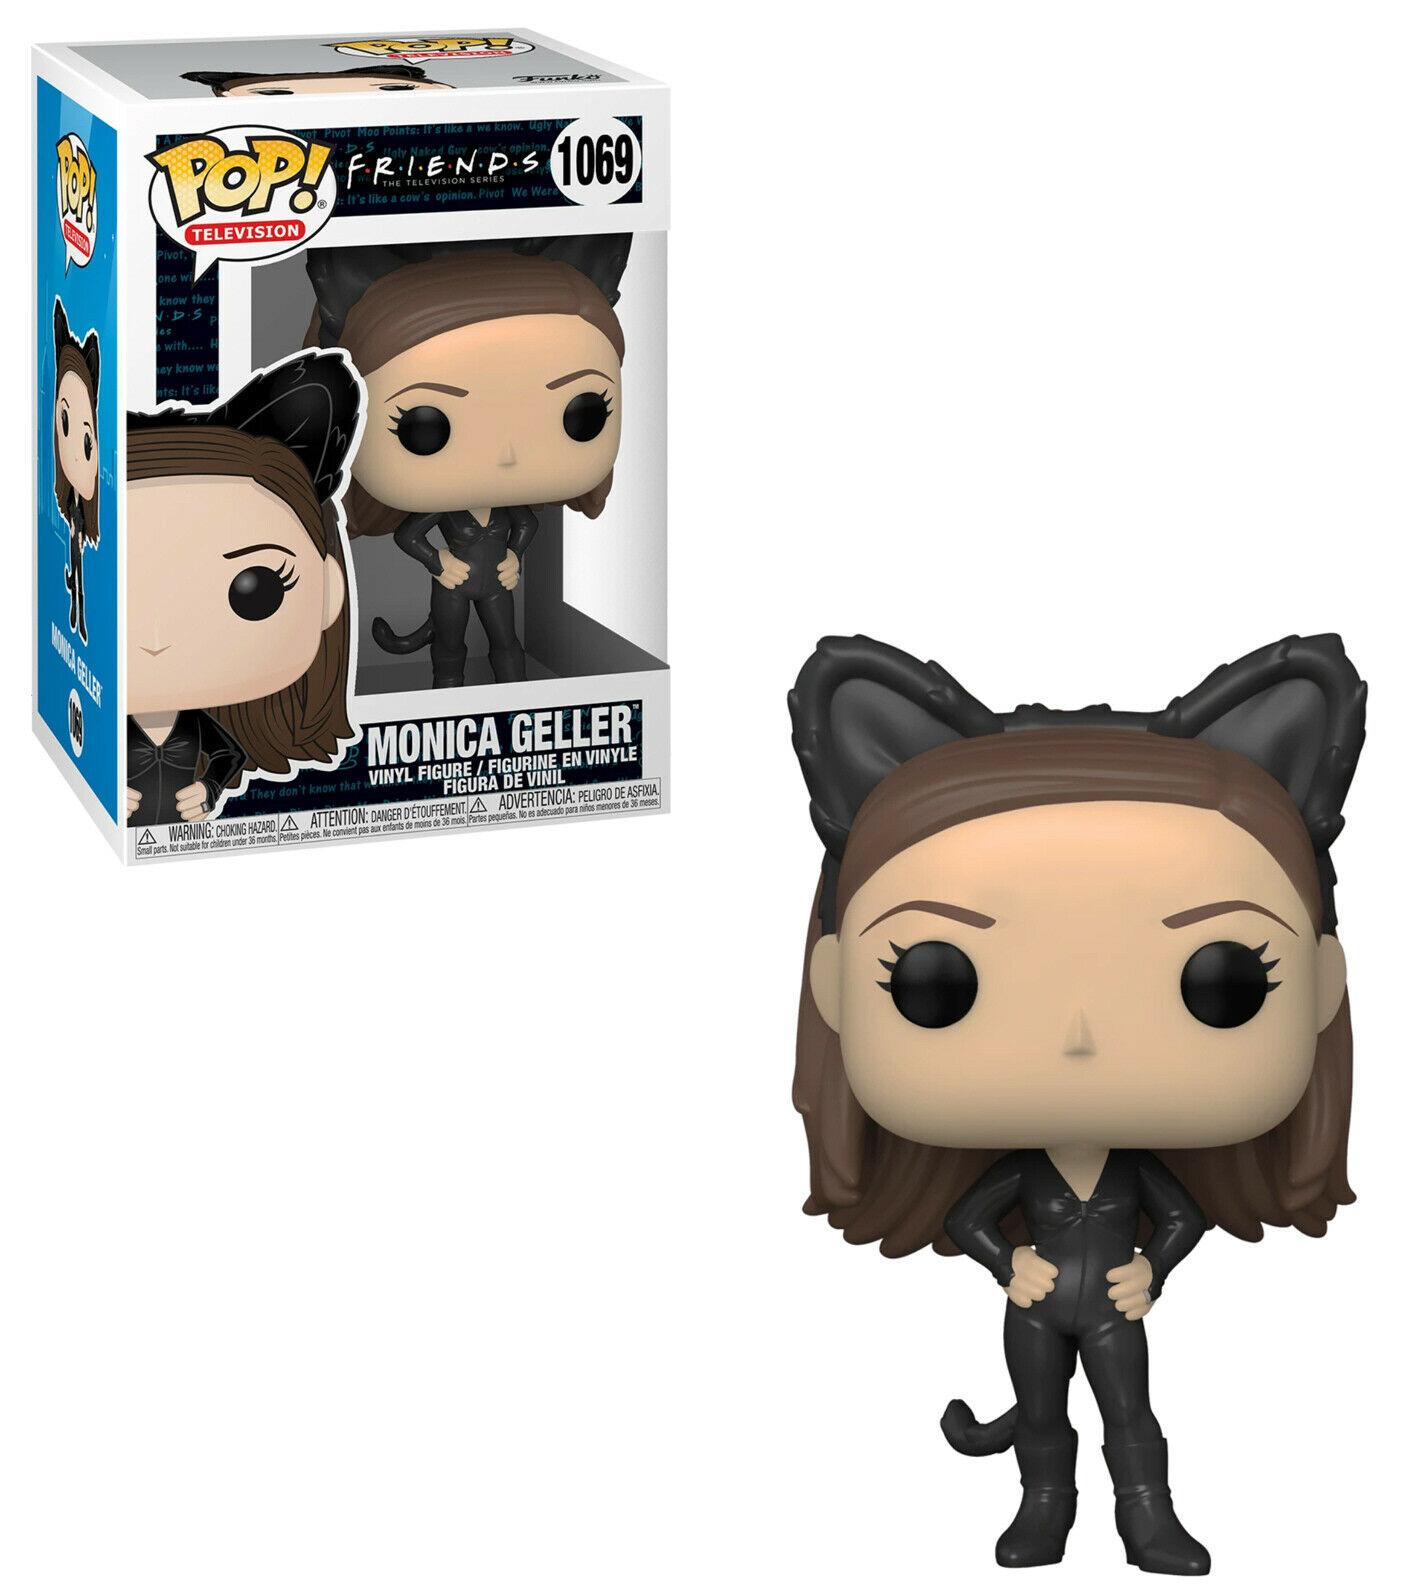 Bundled with EcoTek Protector to Protect Display Box Friends Vinyl Figure Monica Geller as Catwoman Pop #1069 Pop TV